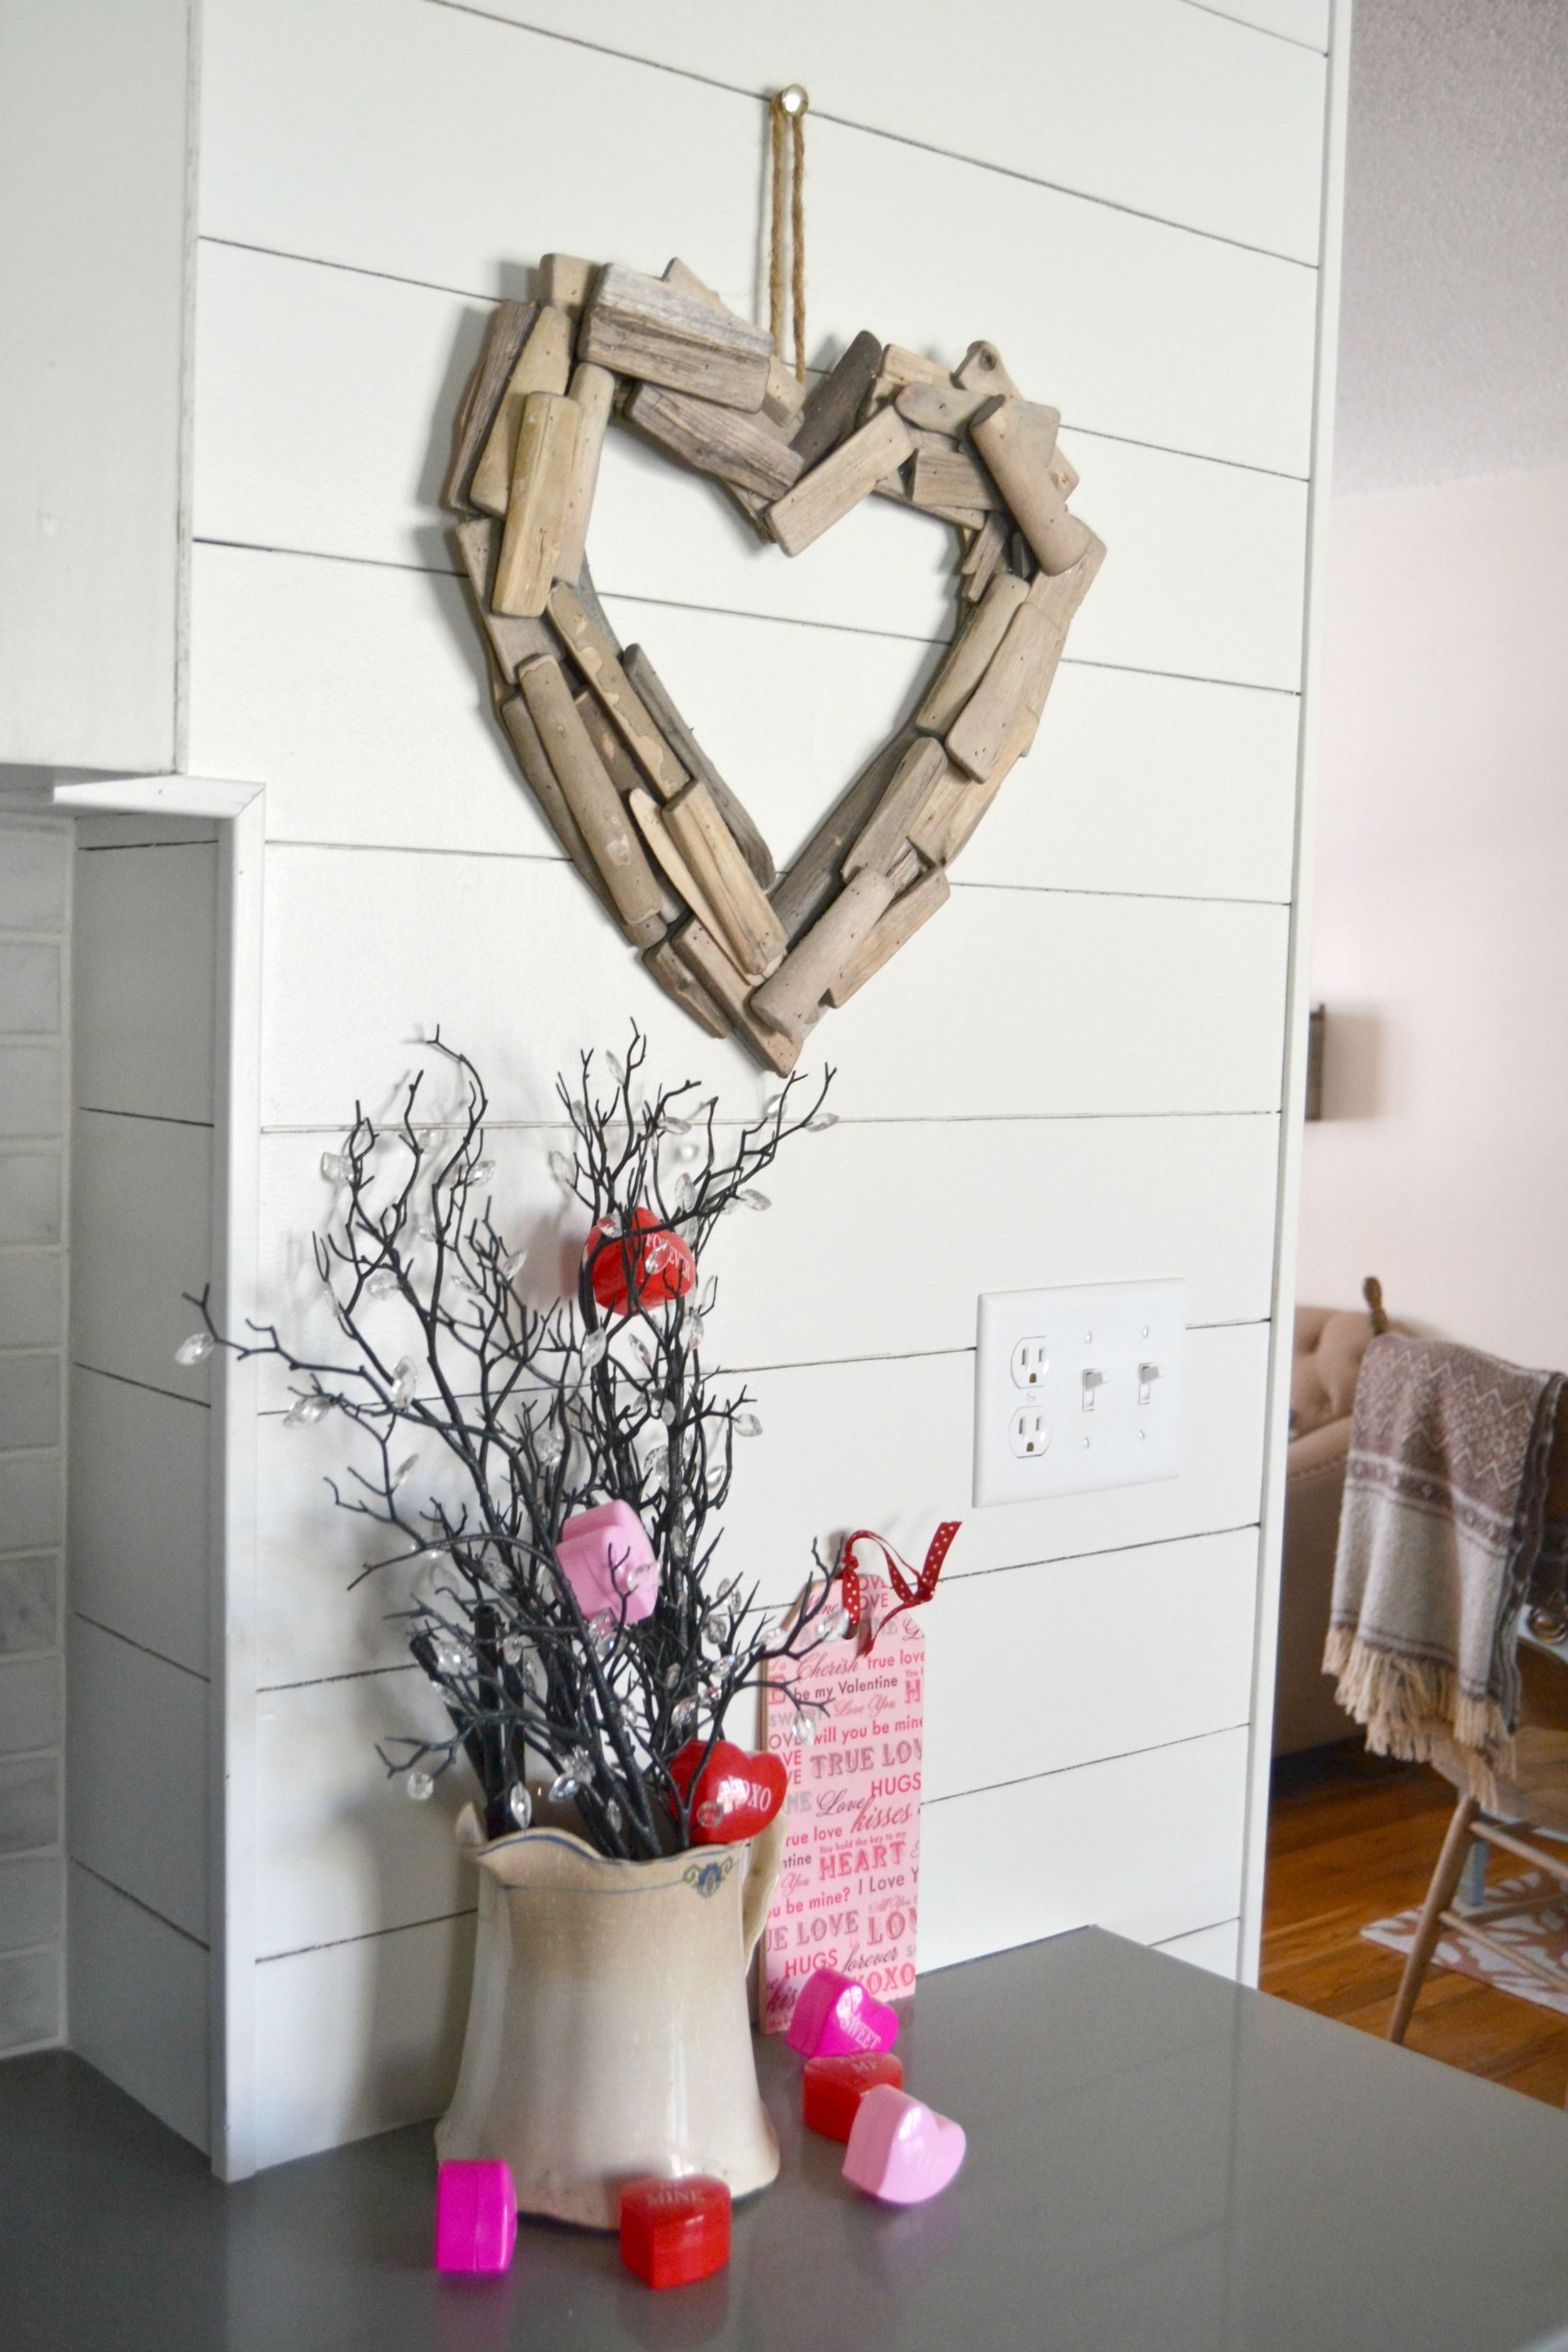 Diy driftwood heart wreath from my creative days valentine